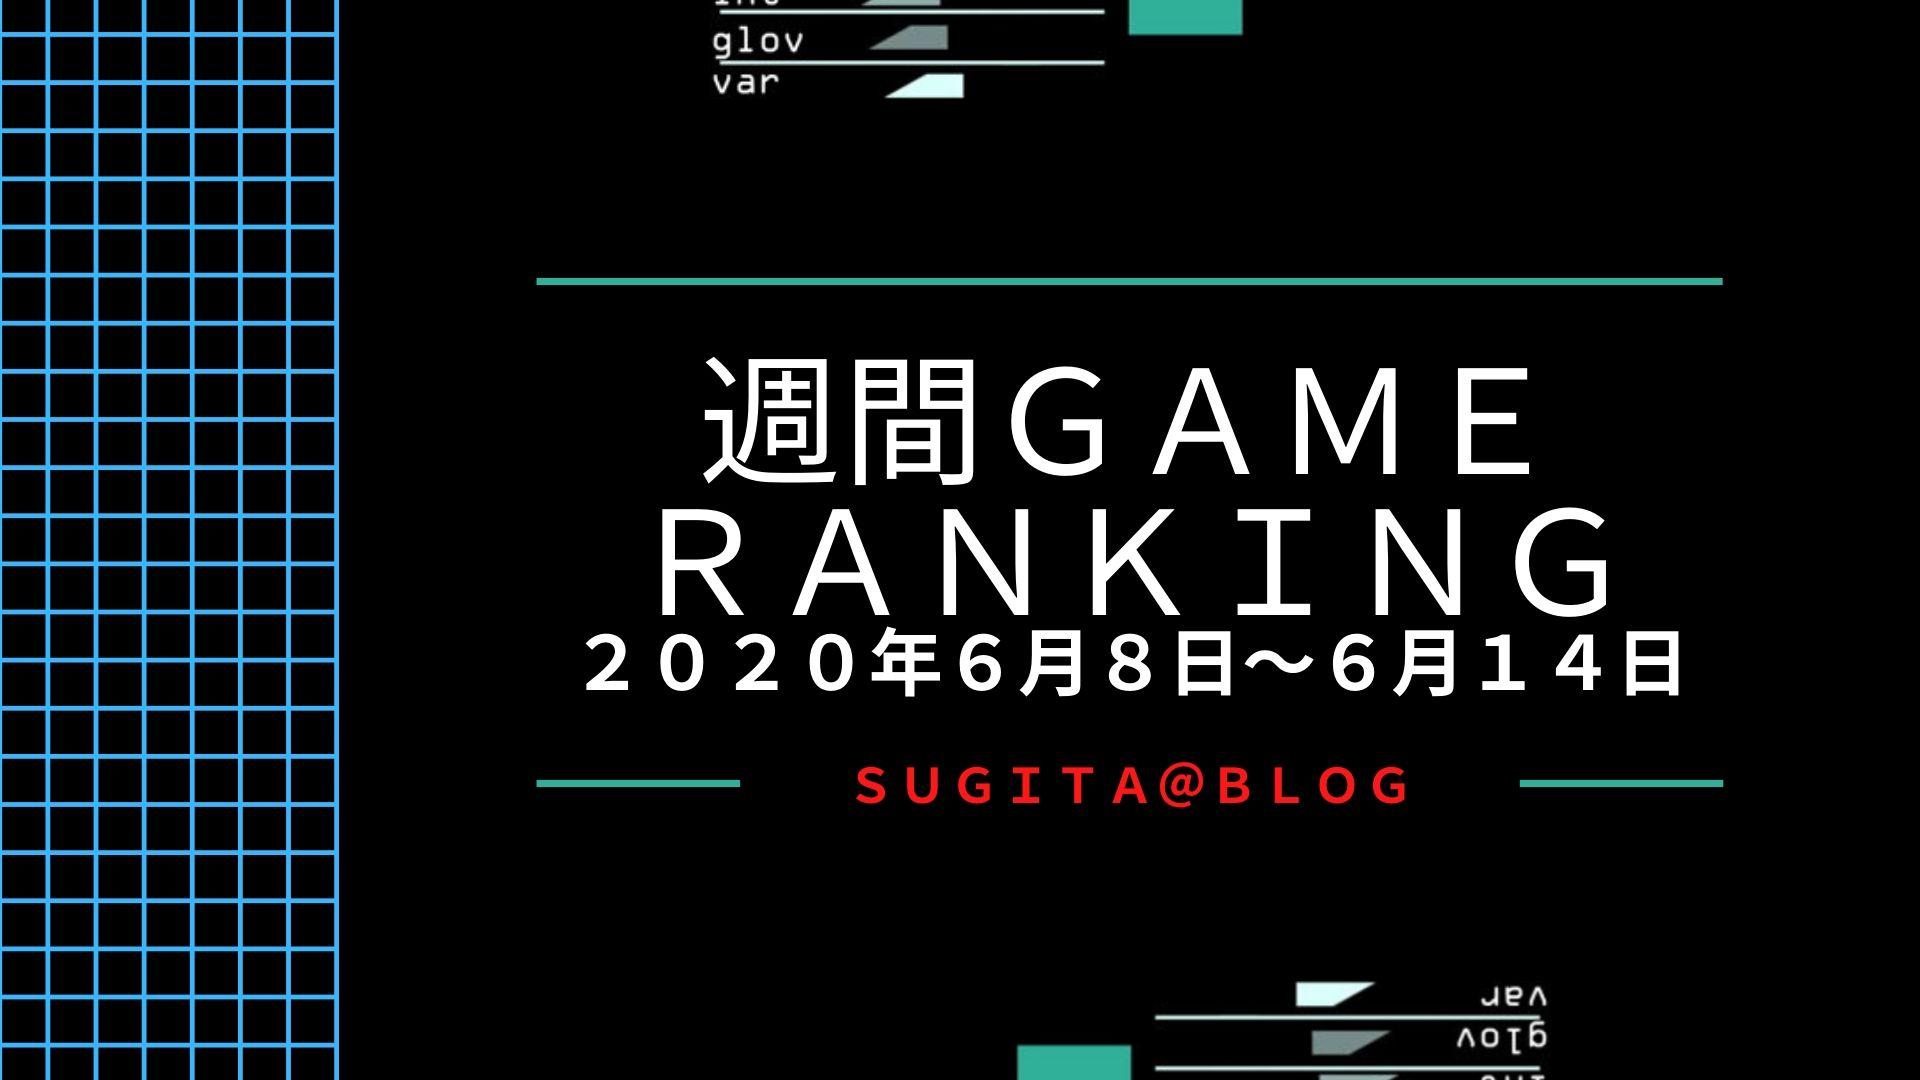 週間GAME RANKING 2020年6月8日~6月14日